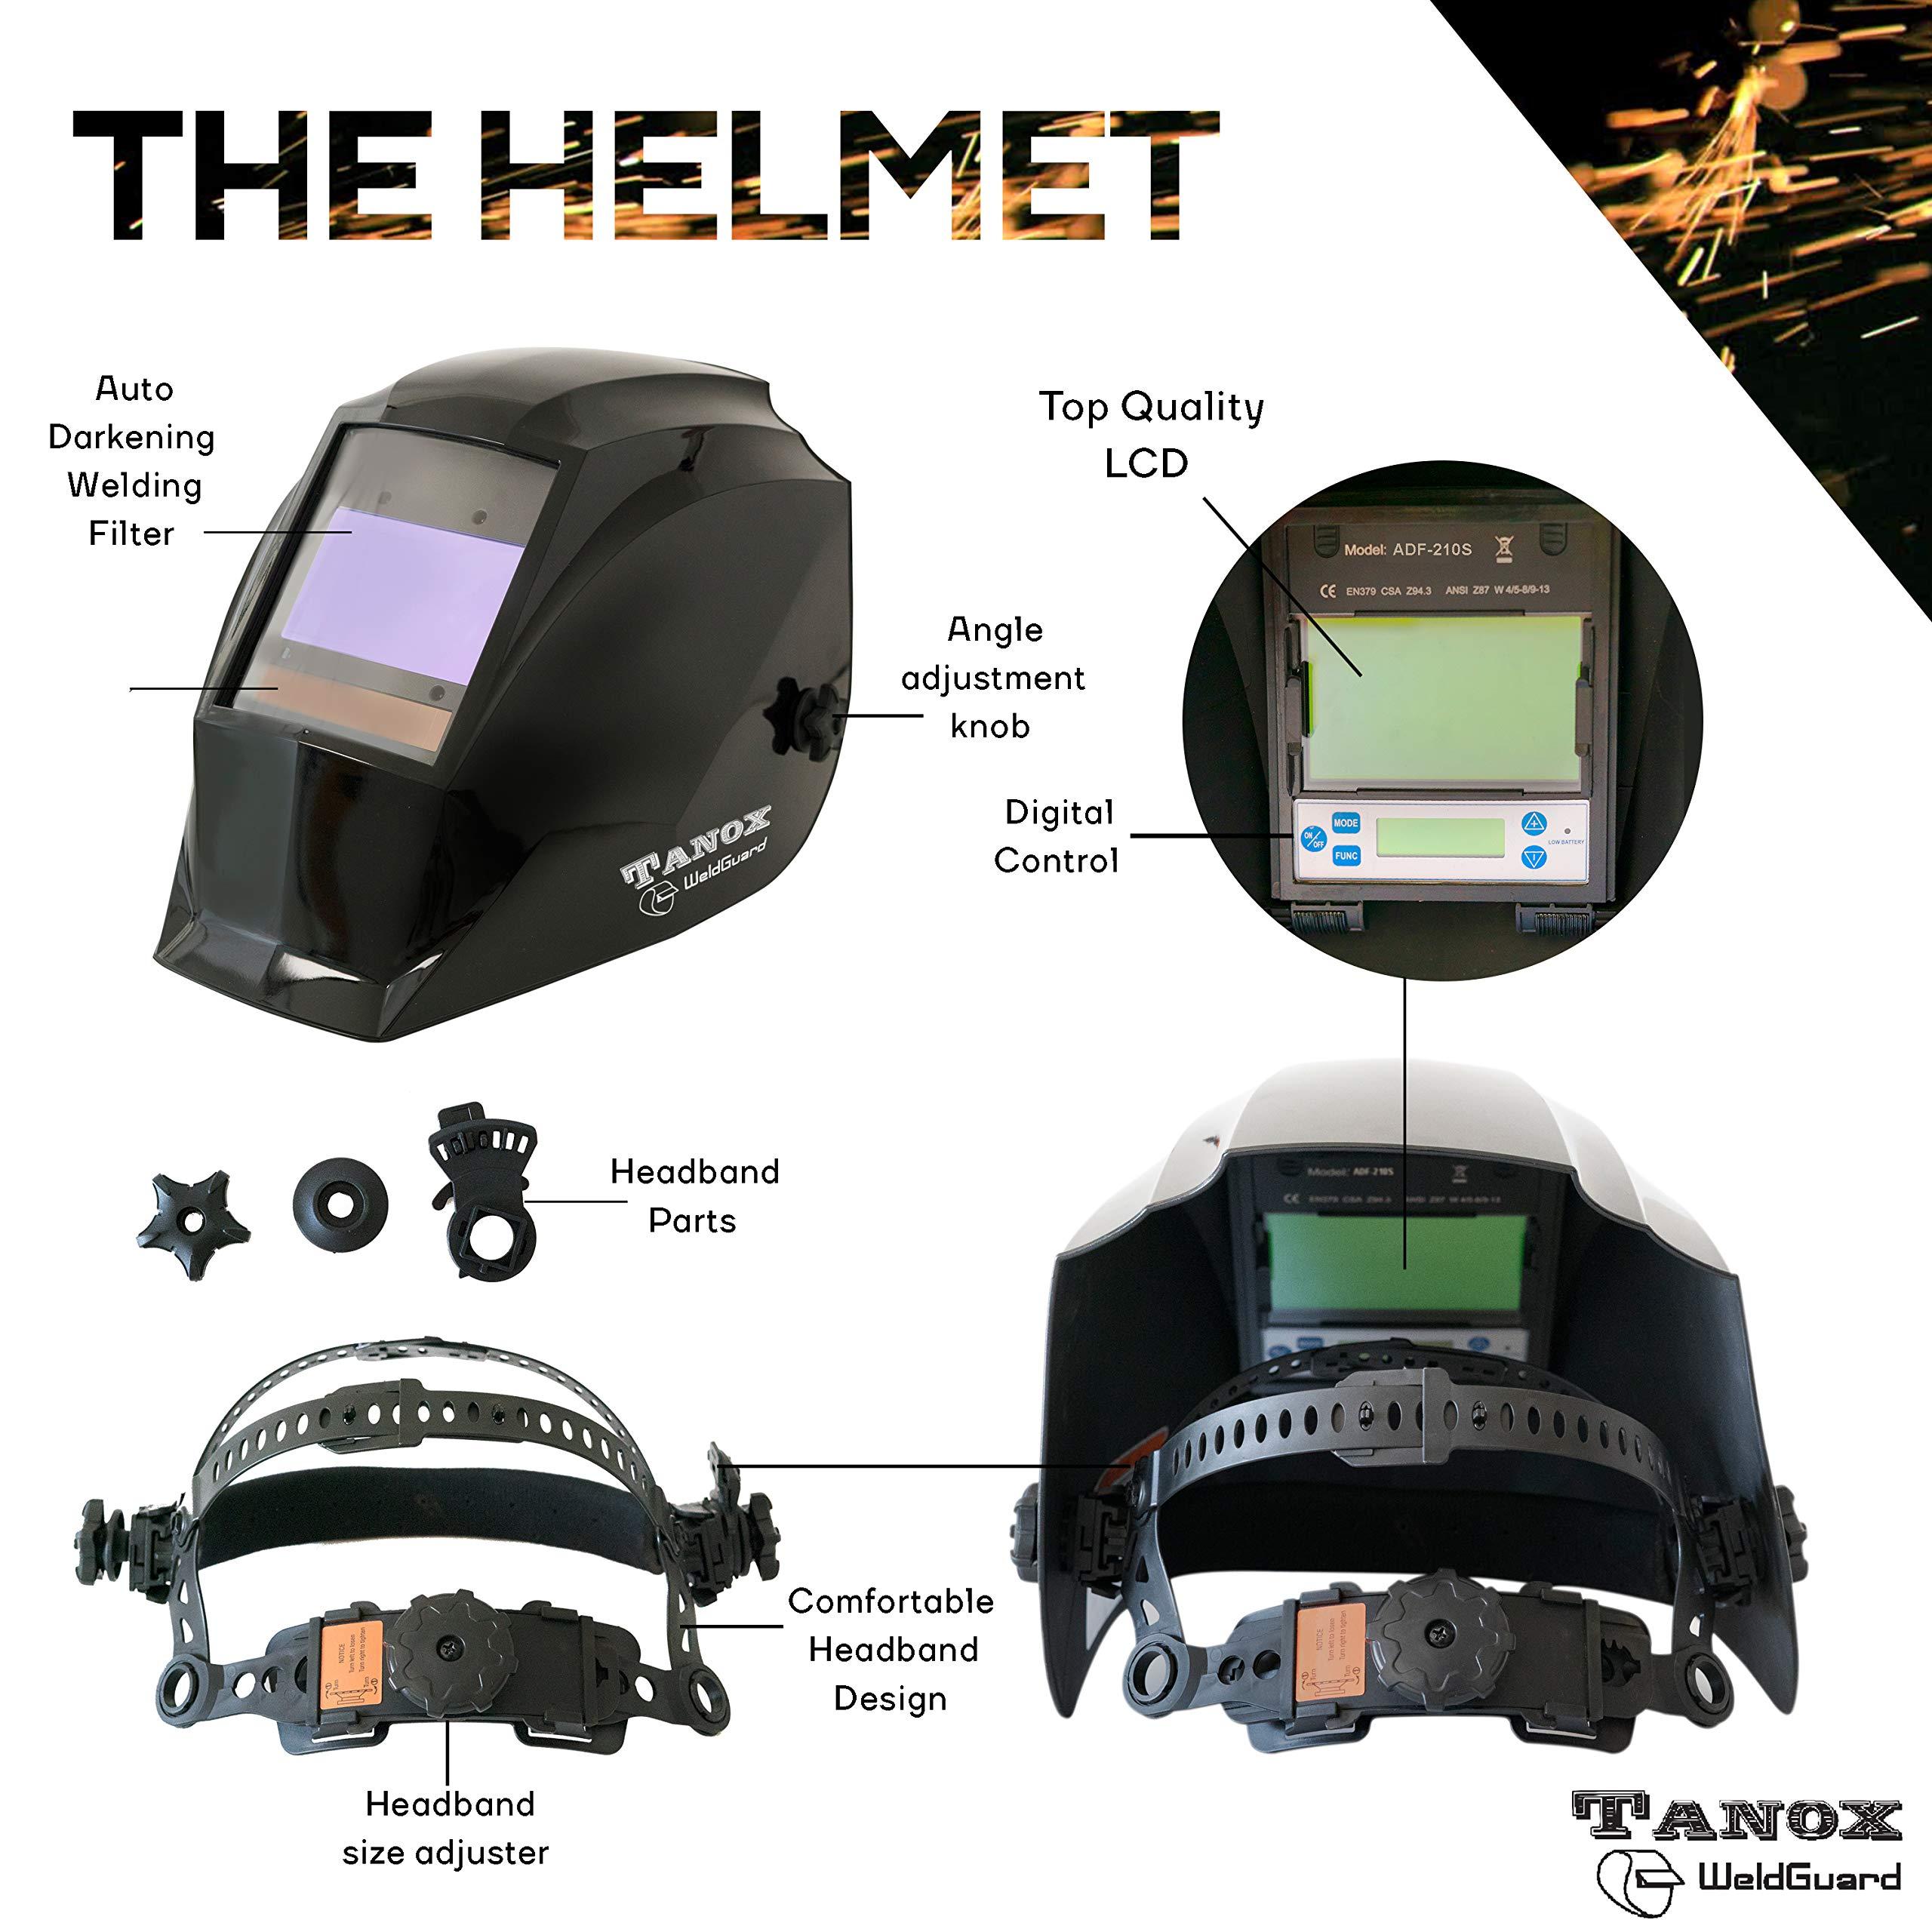 Digital Display auto Darkening Solar Powered Welding Helmet ADF-210S, Solar Shade Lens, Tig Mig MMA, Adjustable Range 4/9-1316 Bonus 16'' Fire Retardant Welding Gloves, Carrying Bag and spare lens by Tanox (Image #4)